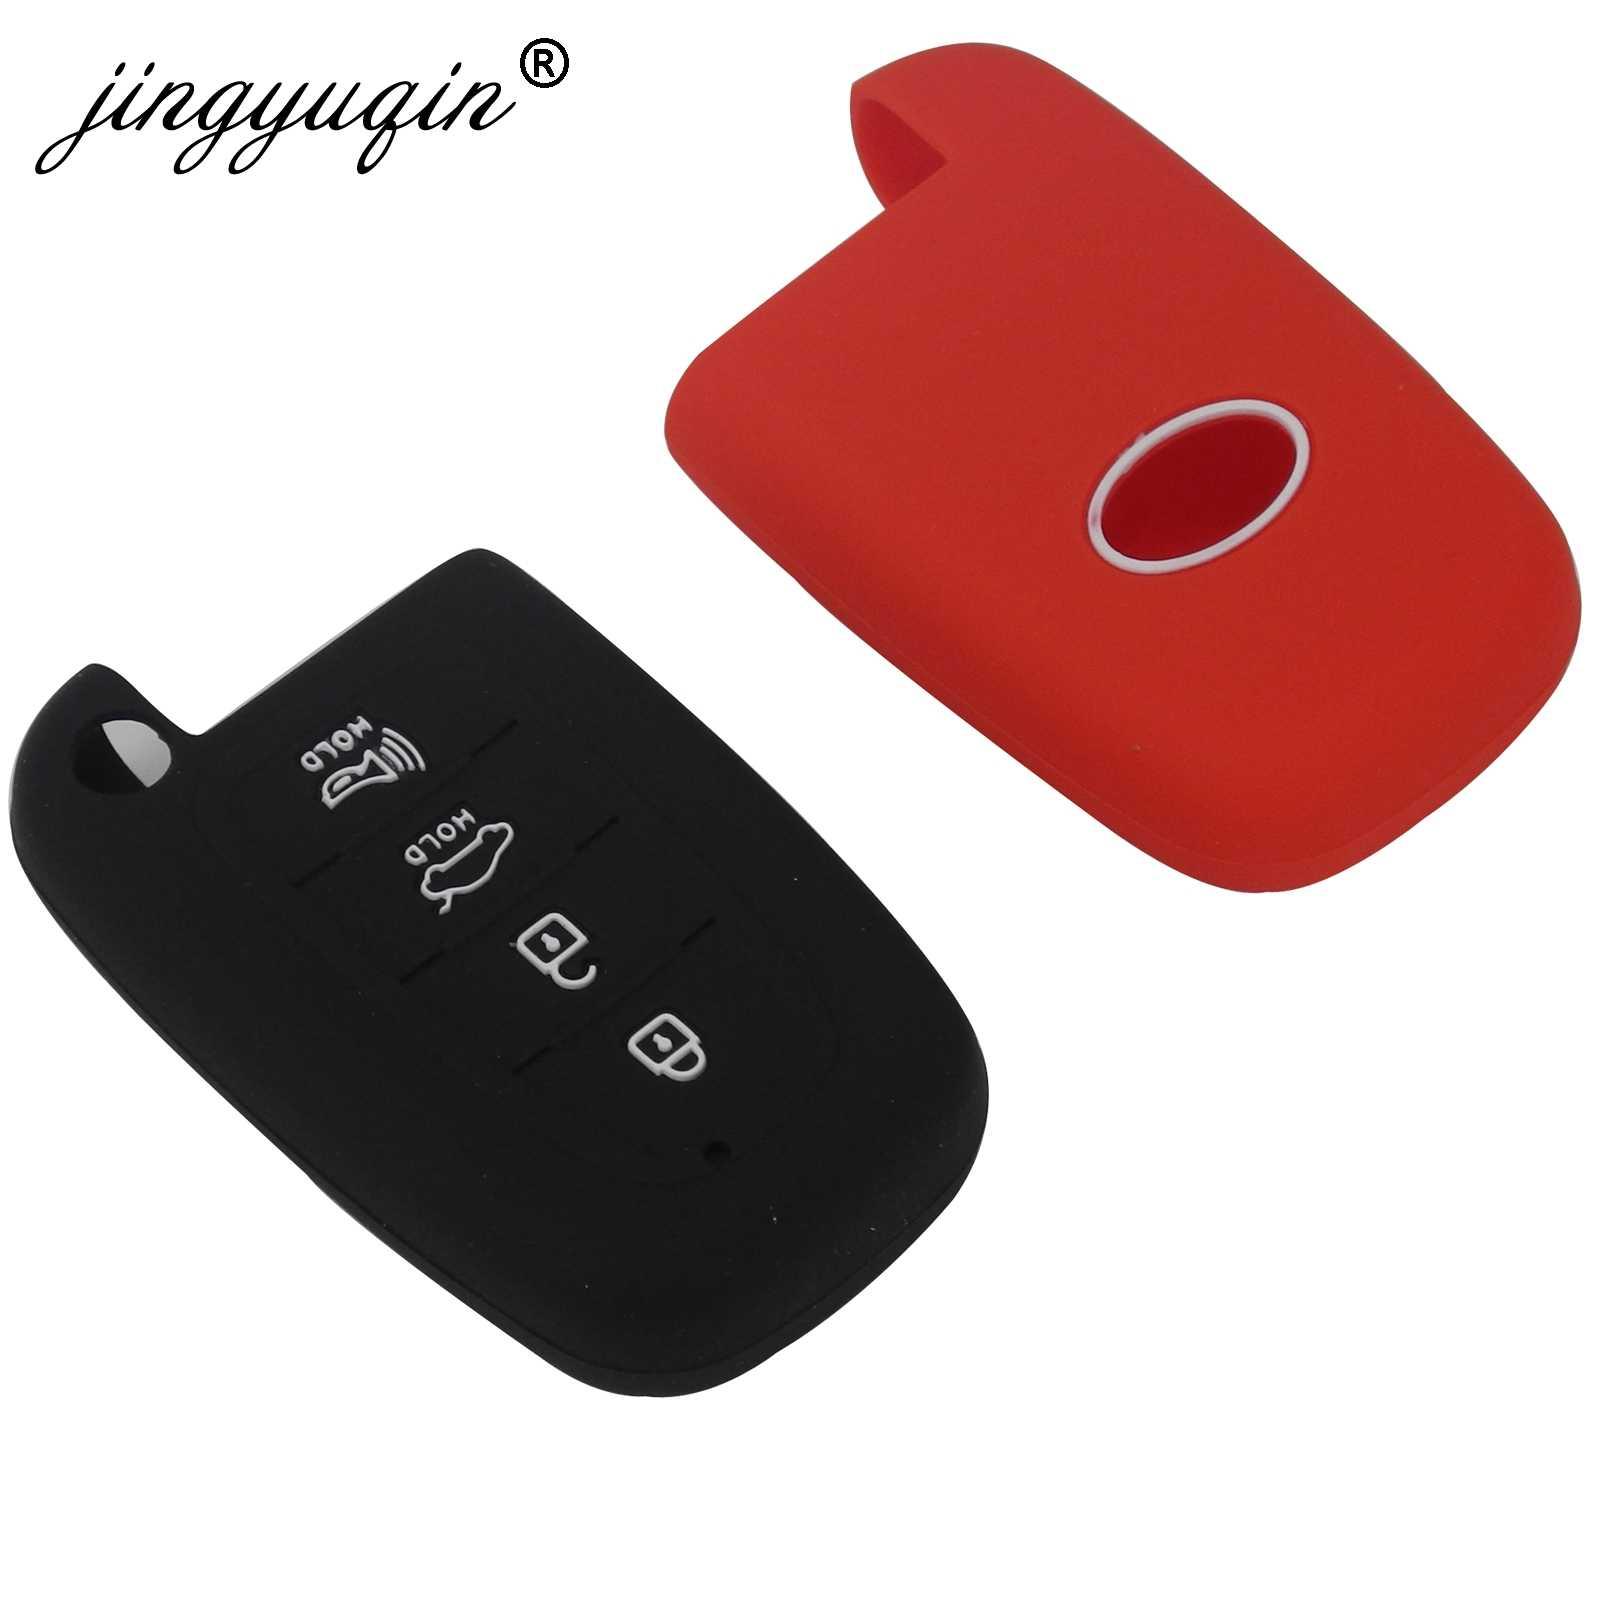 Jingyuqin 4 düğme silikon anahtar kılıfı HYUNDAI Elantra Sonata Veloster Kia Soul Sportage araba uzaktan akıllı Fob kapak